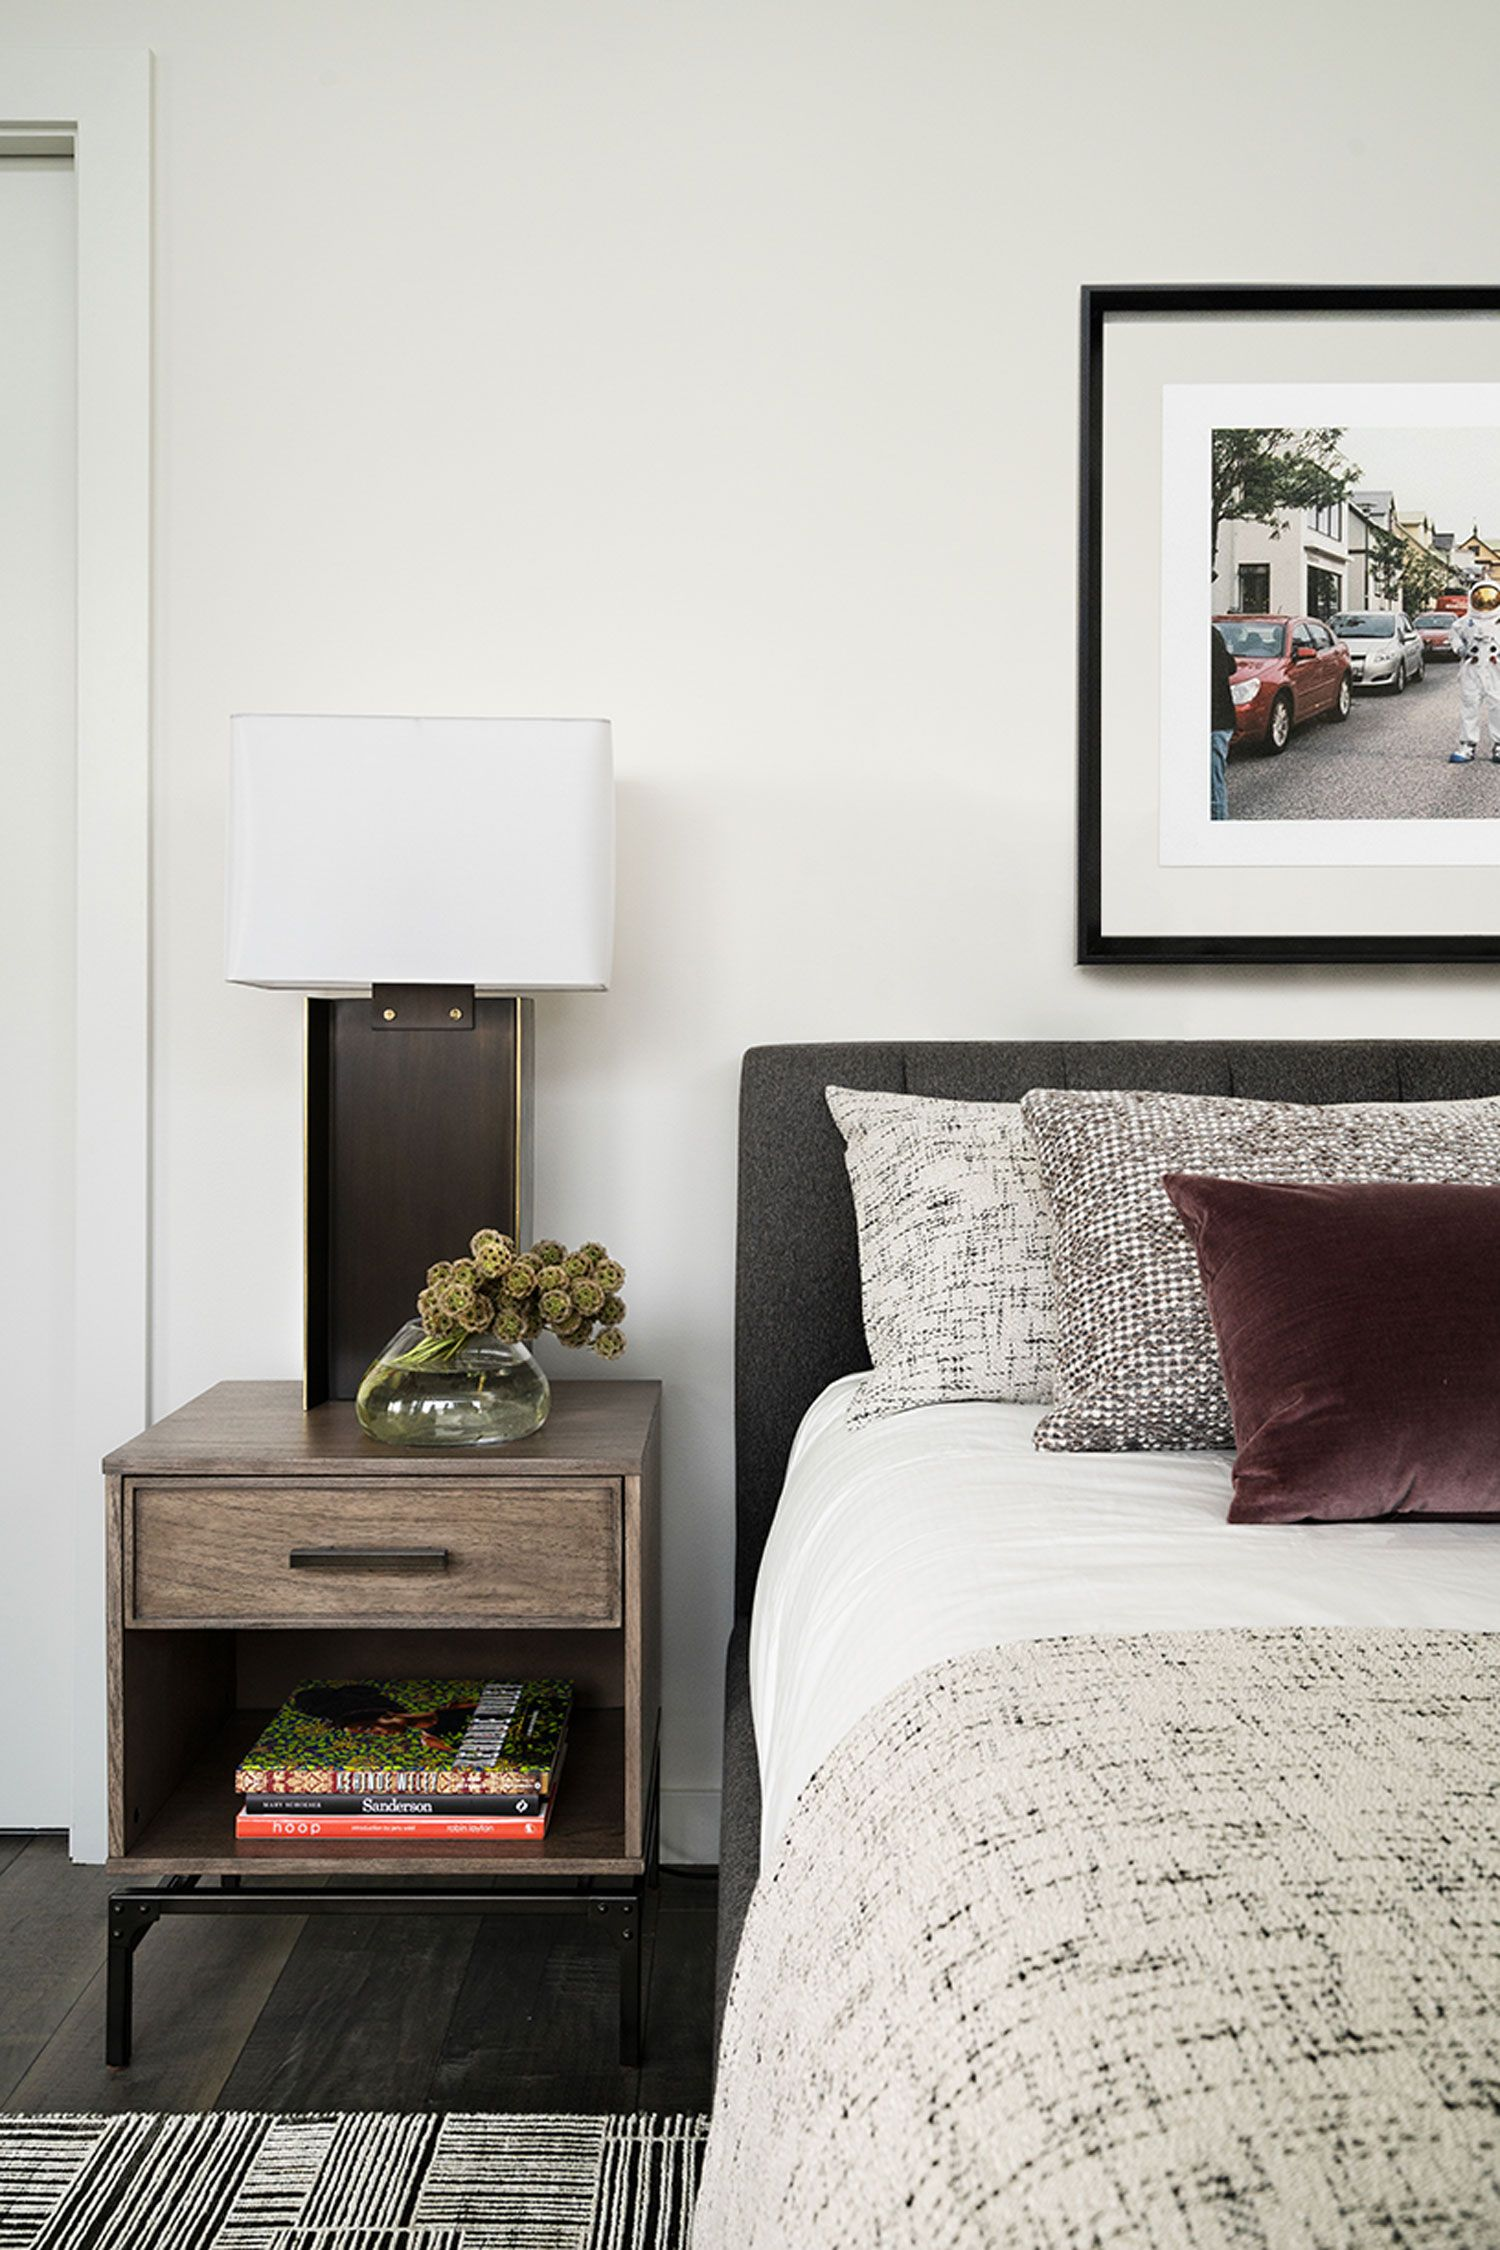 Loft bedroom images  Modern Urban Loft Bedroom  Seattle WA  Urban Loft  Pinterest